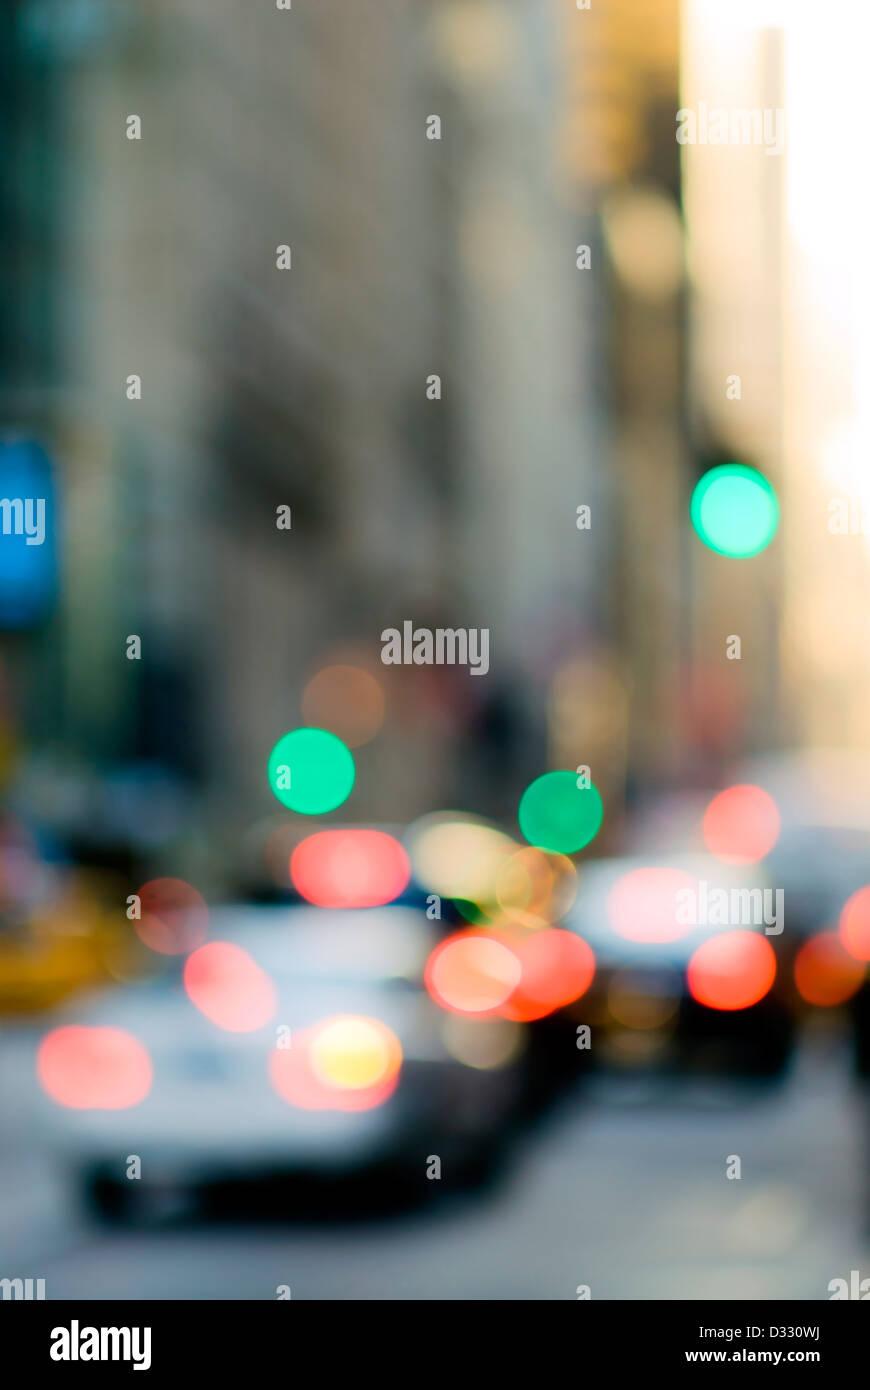 Abstrakte urbanen Straßenbild mit Verkehr, New York City. Stockbild